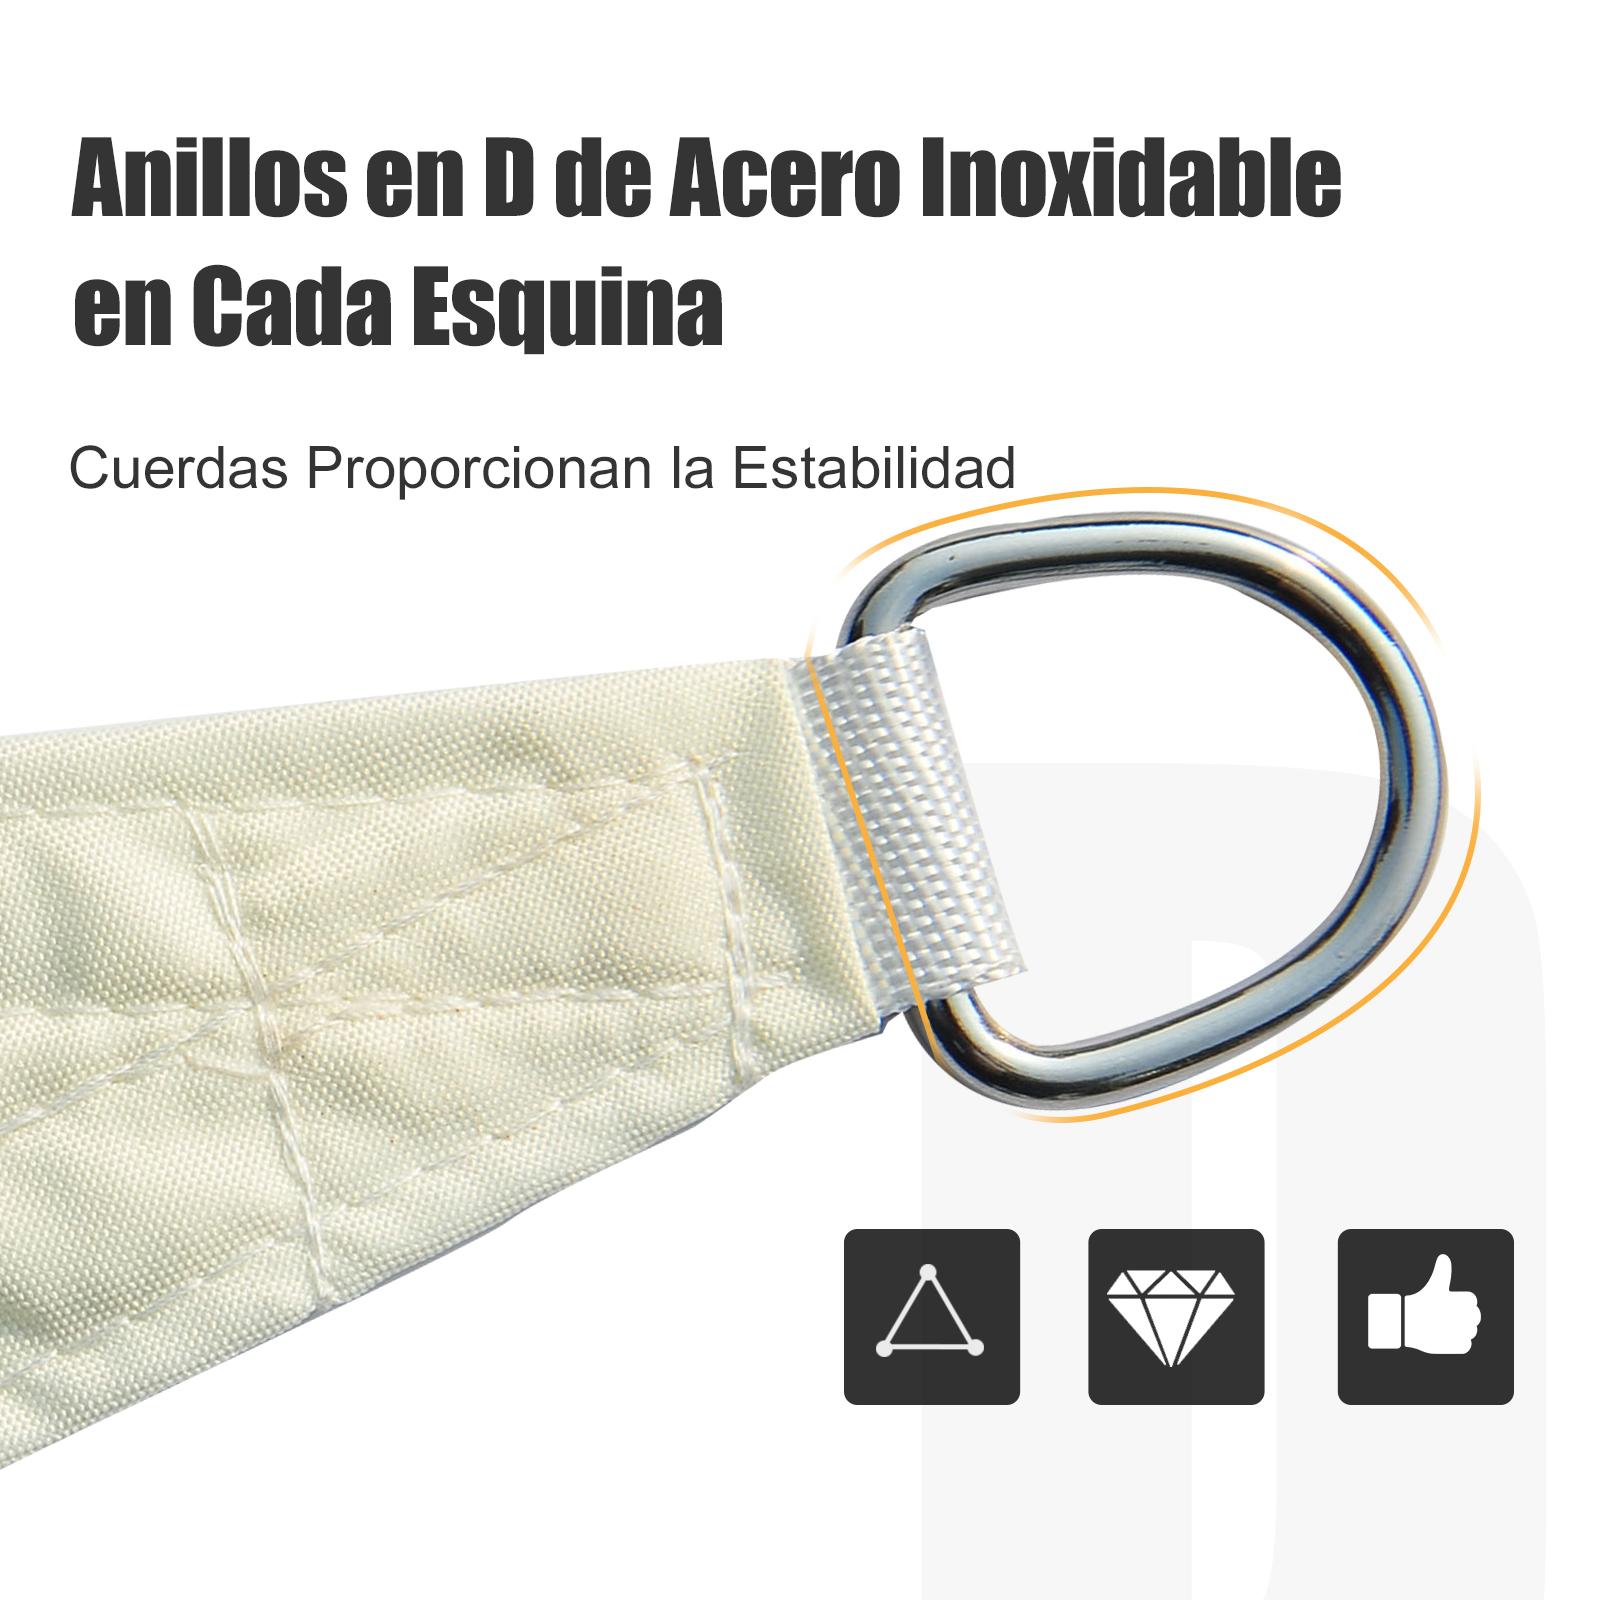 Toldo-de-Vela-Rectangular-para-Jardin-y-Exterior-Repelente-al-Agua-Proteccion-UV miniatura 16